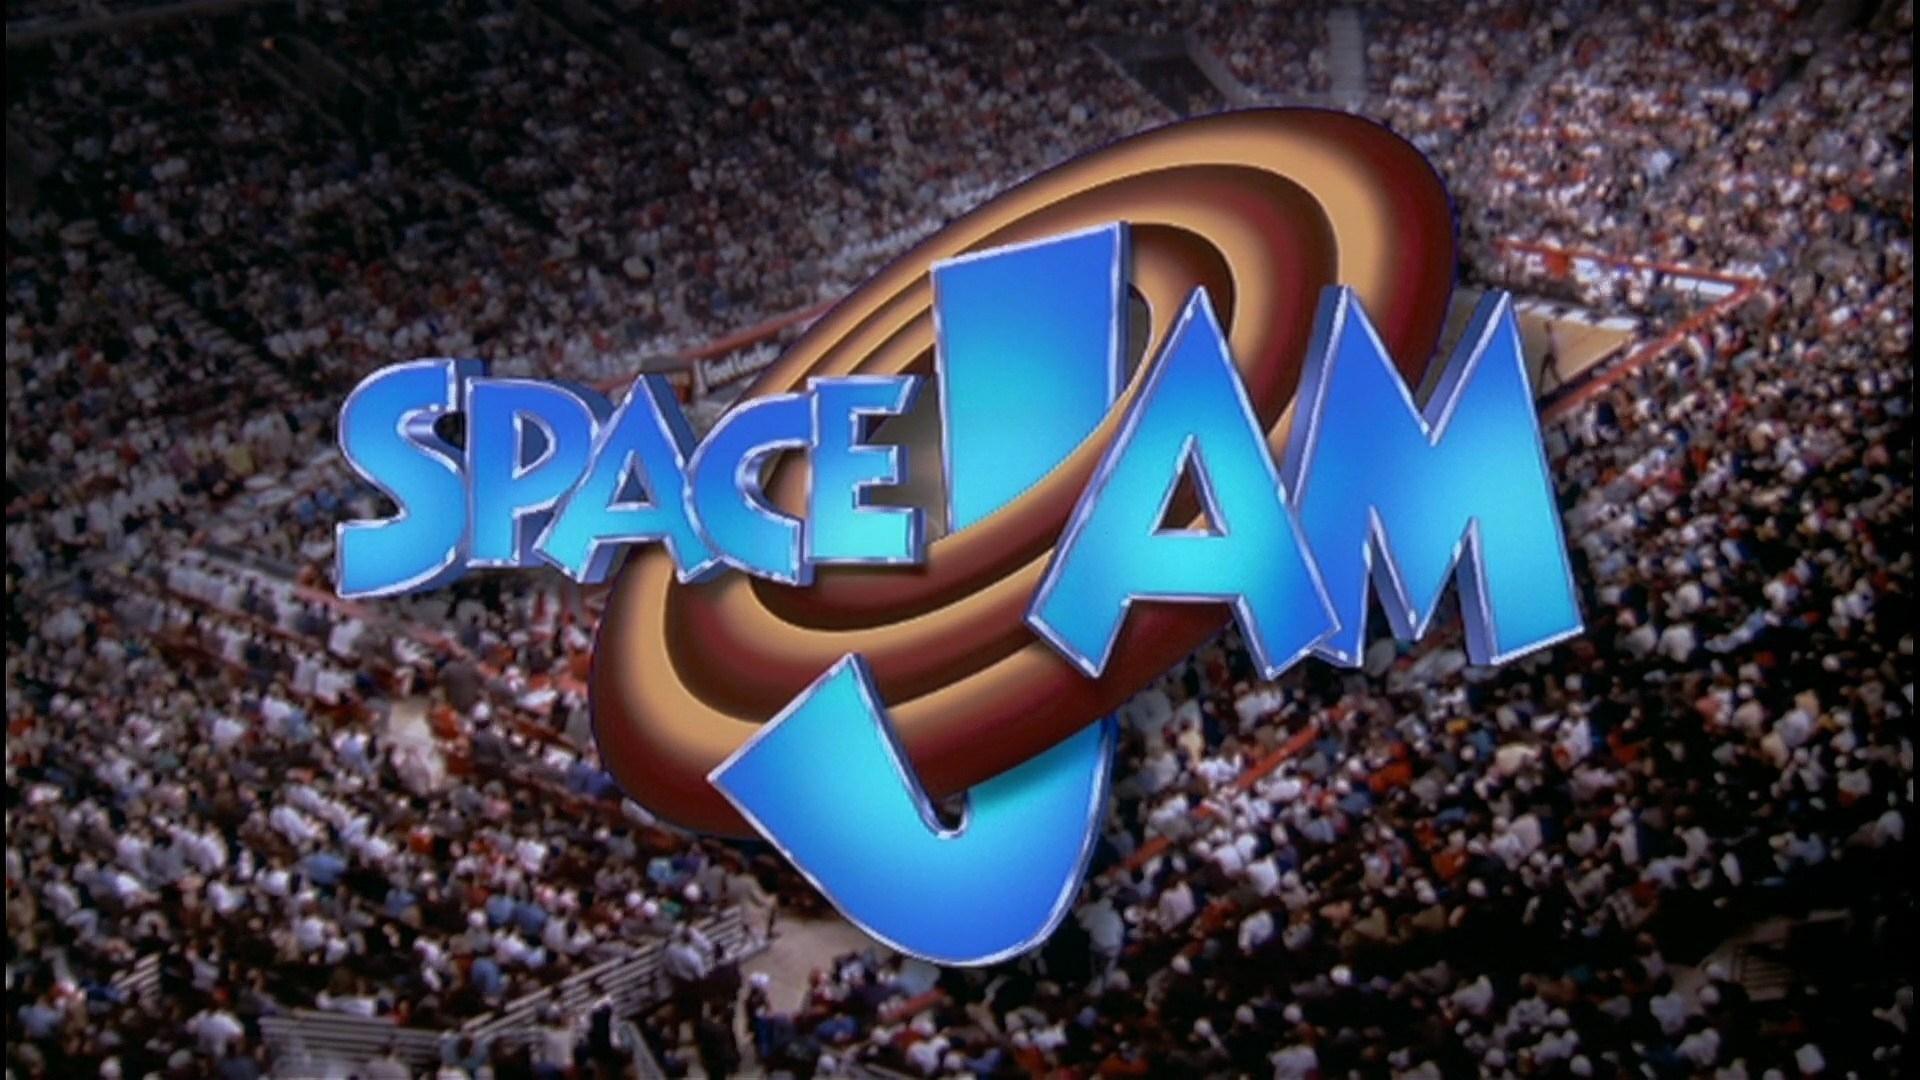 space jam wallpapers 4 - download hd wallpapers